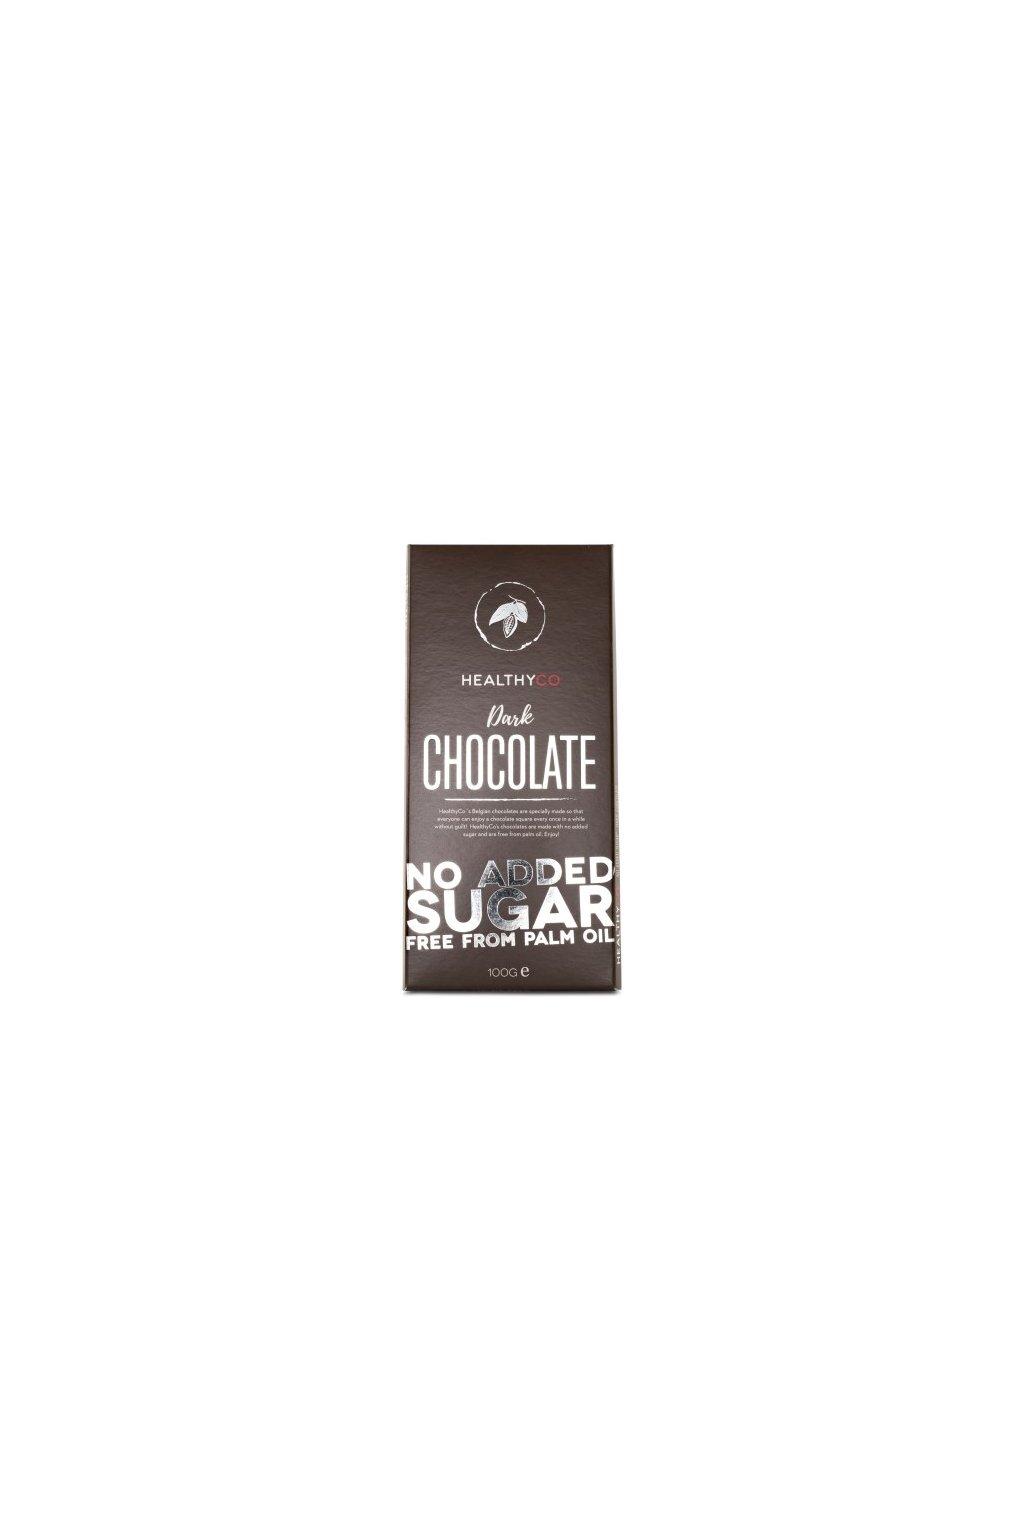 healthyco chocolate 37308 x2